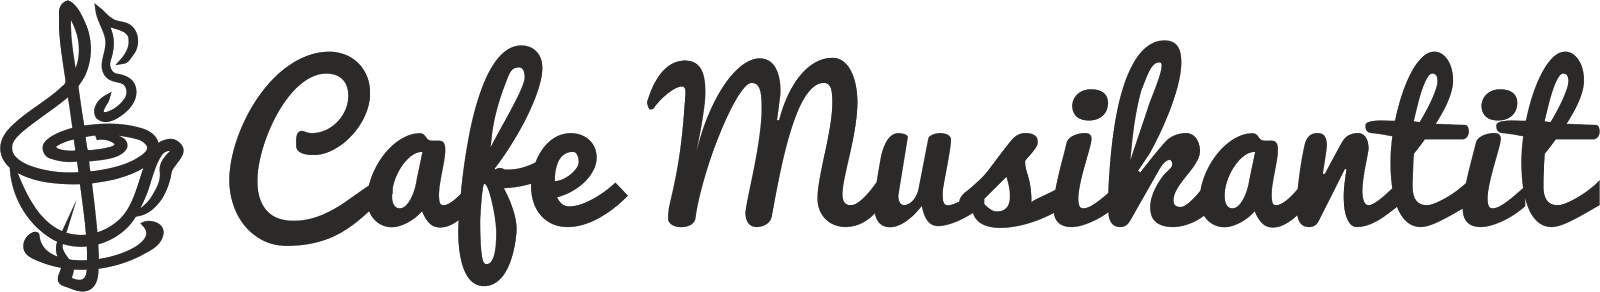 Cafe Musikantit